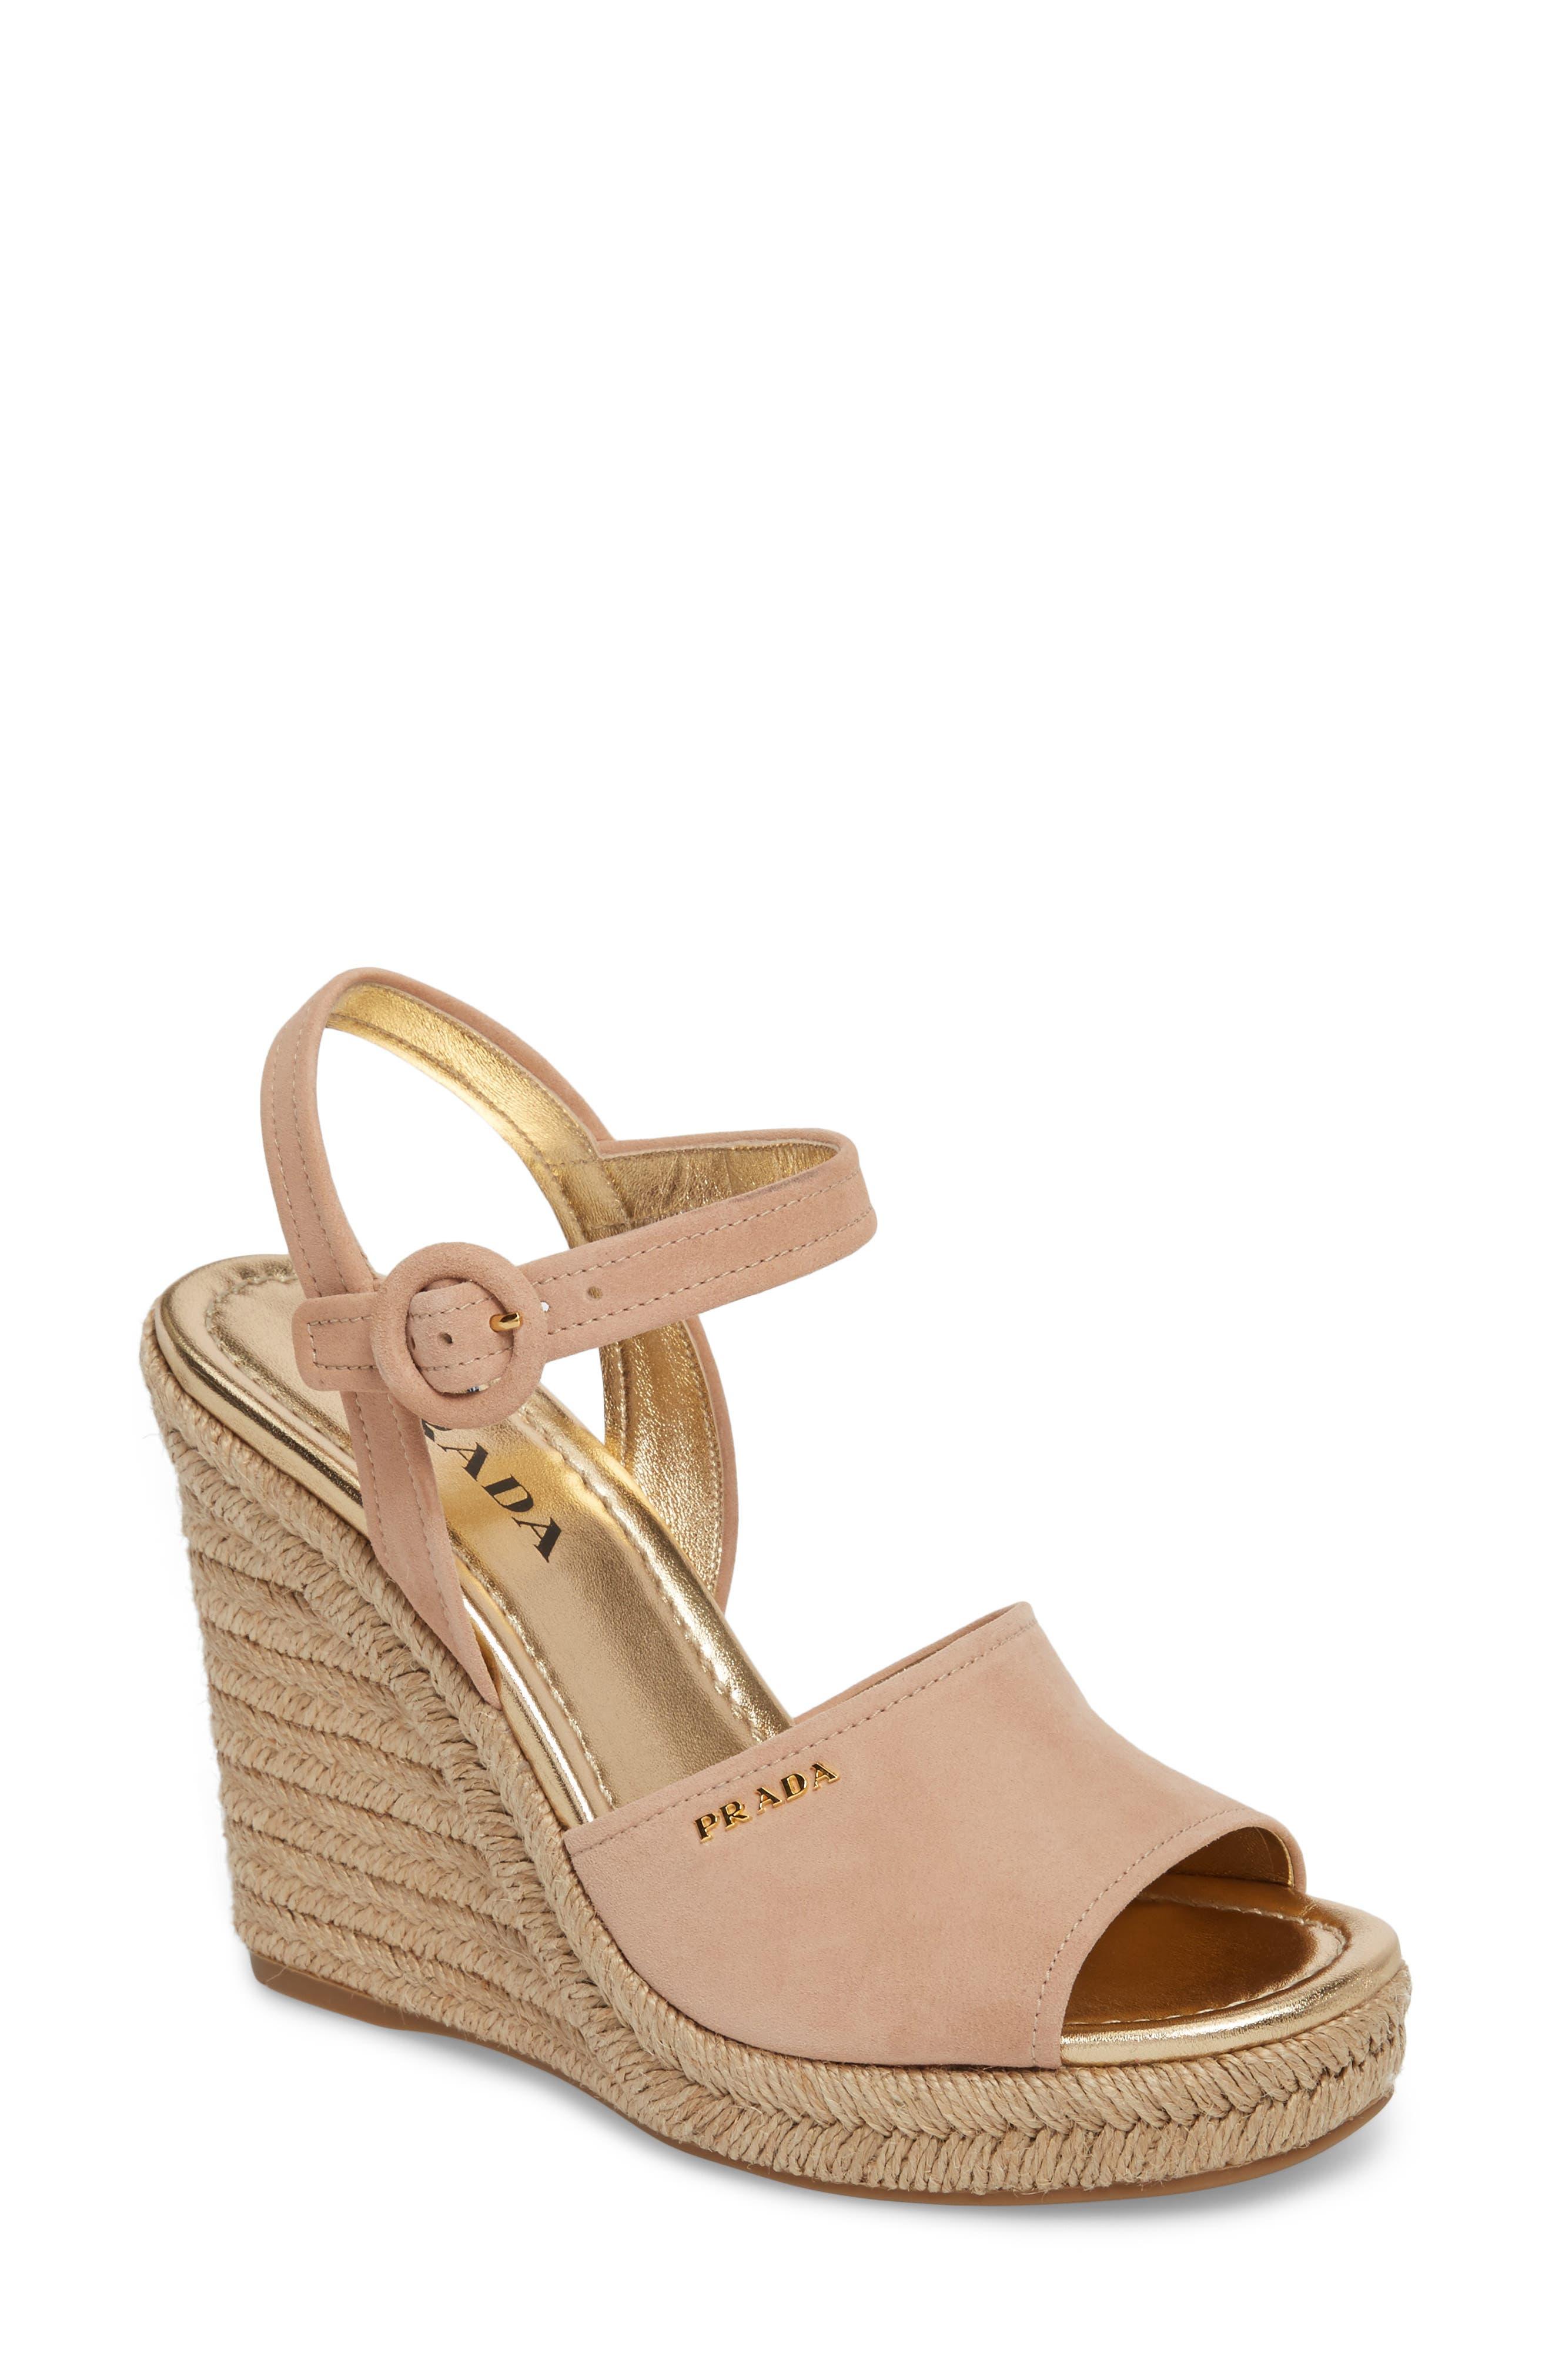 Espadrille Wedge Sandal,                         Main,                         color, 250